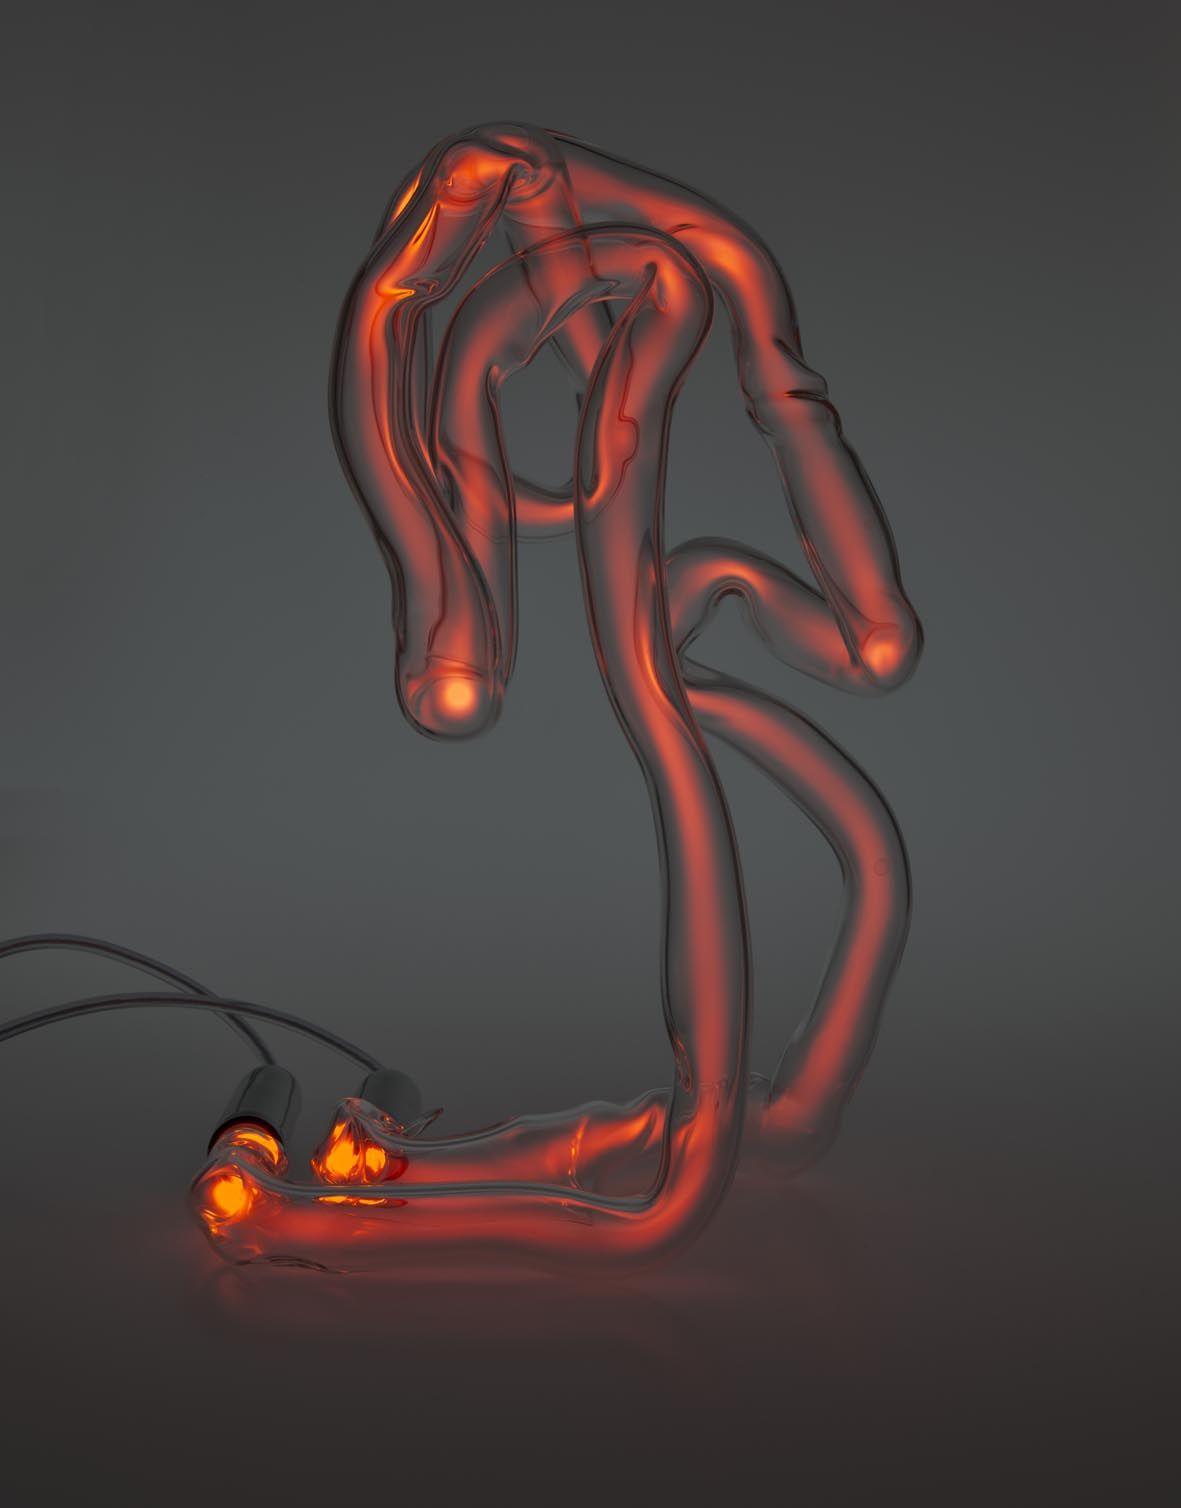 Neon Table Light: Neon Table Light By Jochen Holz Www.matterofstuff.com